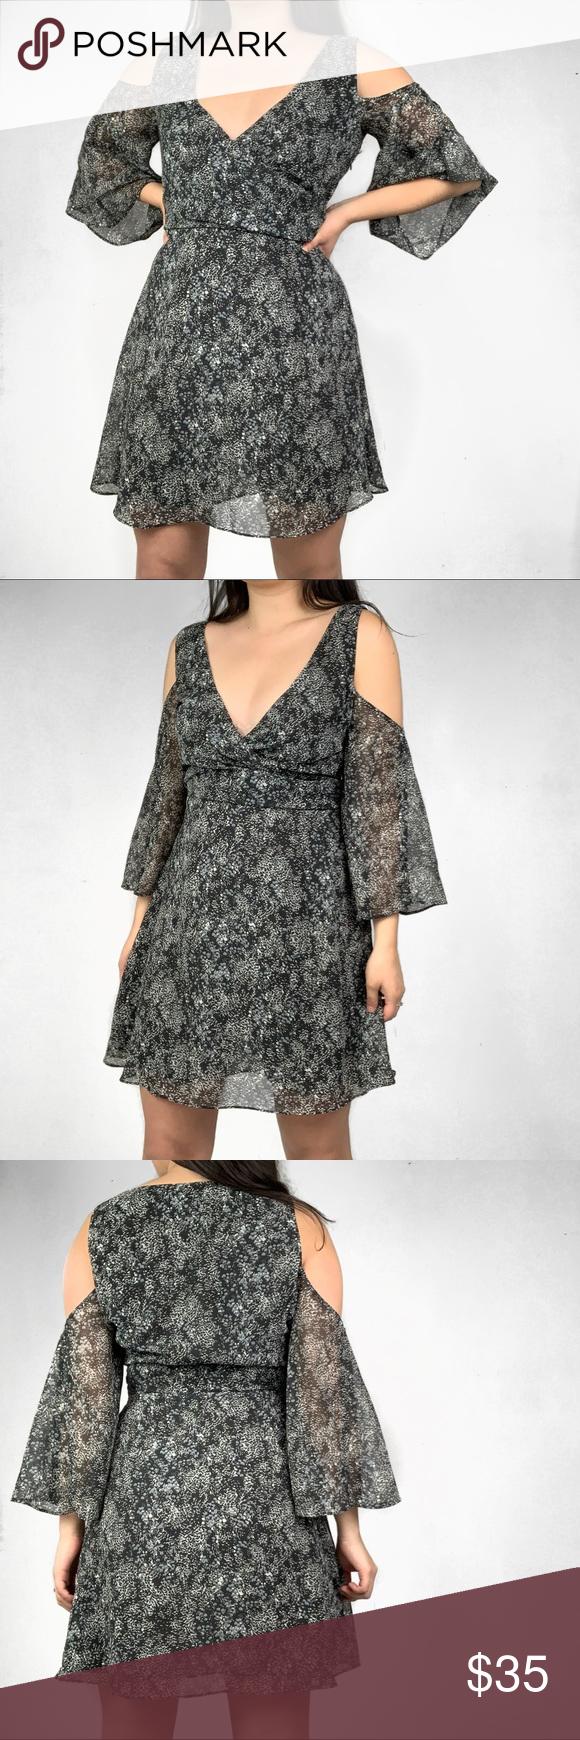 b6f82fdd27 Zara Black Snake Print Cold Shoulder Mini Dress Zara Snake Print Cold  Shoulder Midi Dress.